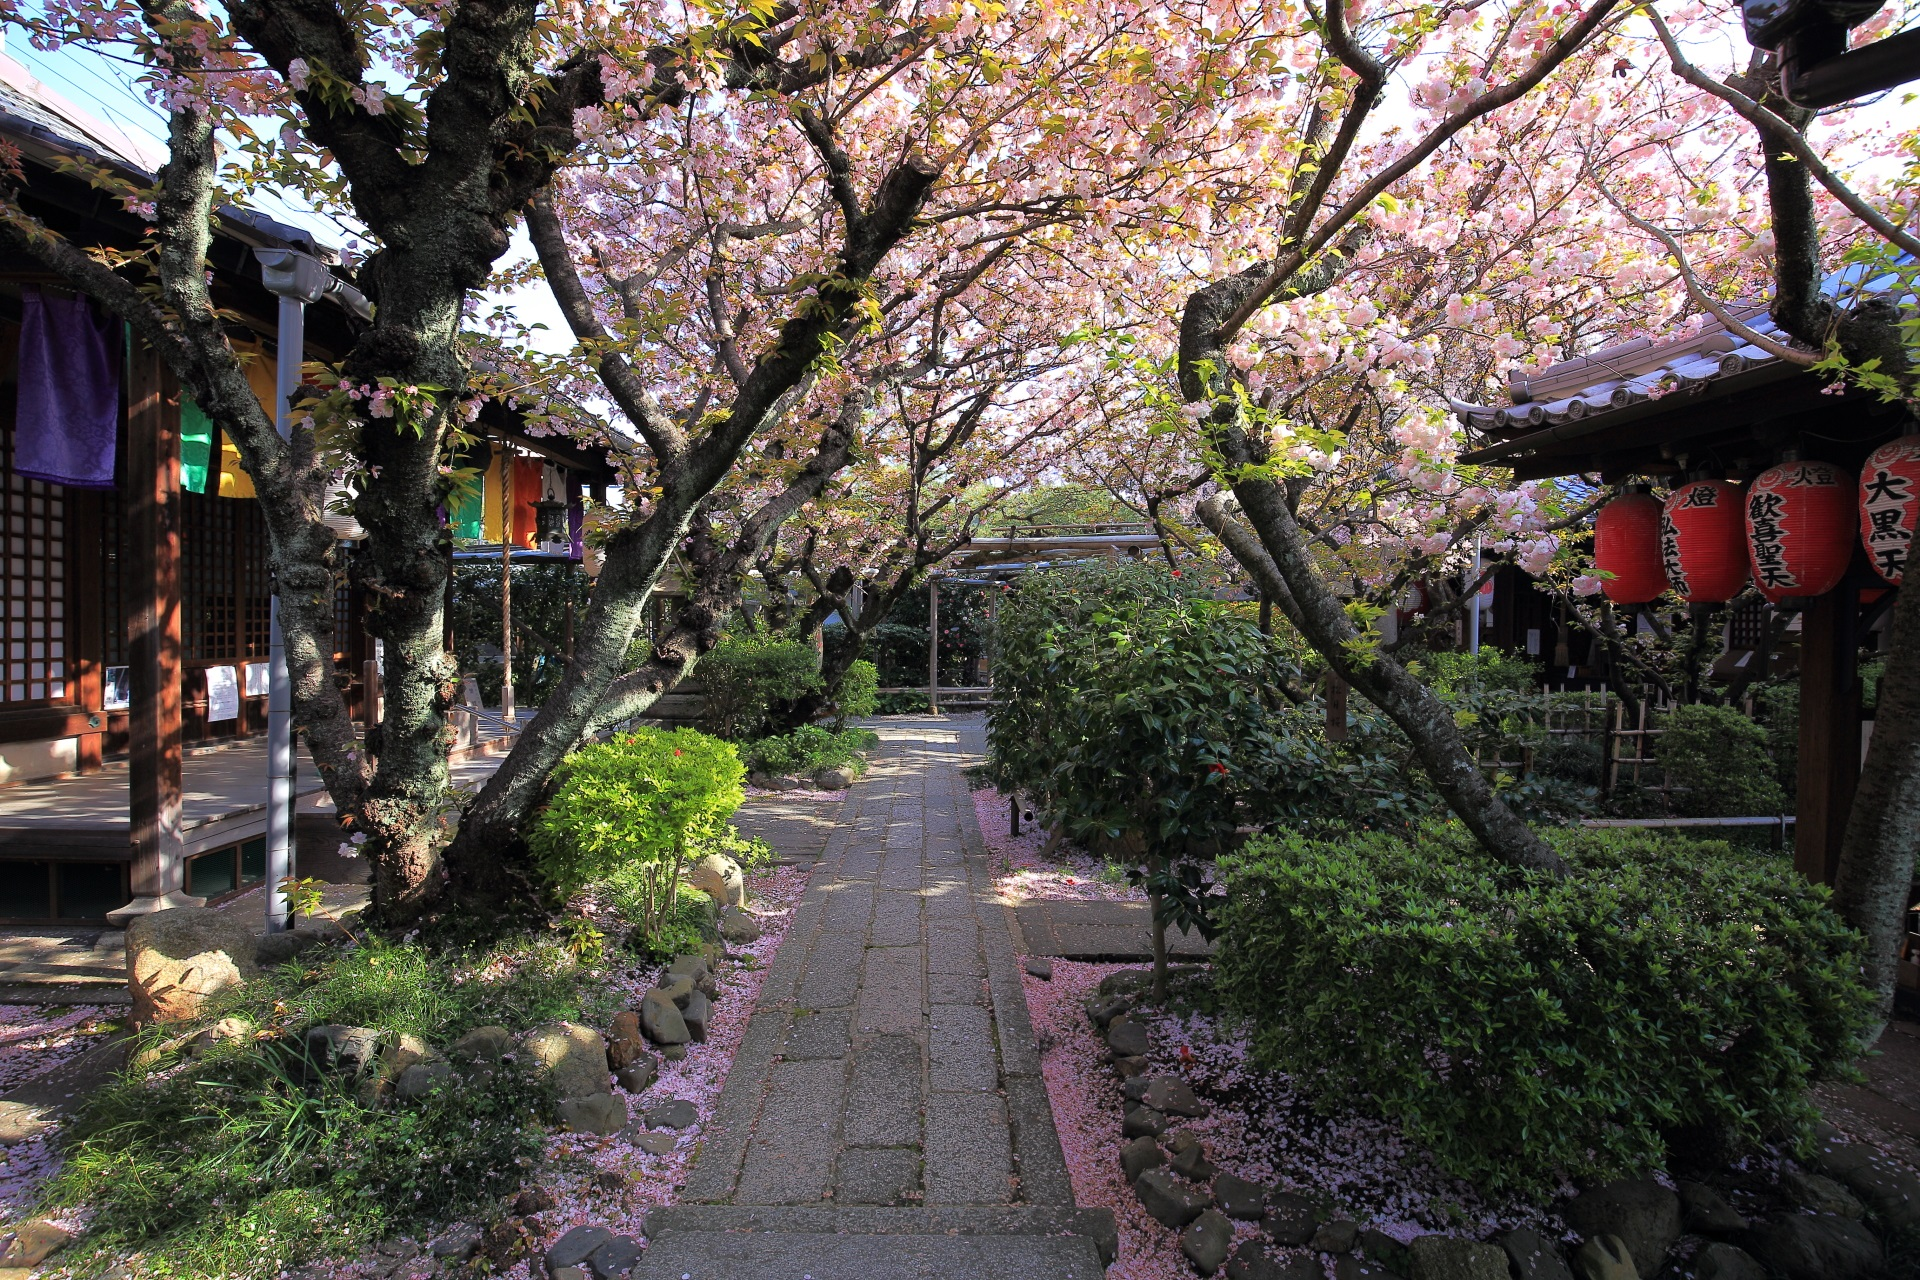 観音堂前の観音桜と歓喜聖天前の歓喜桜